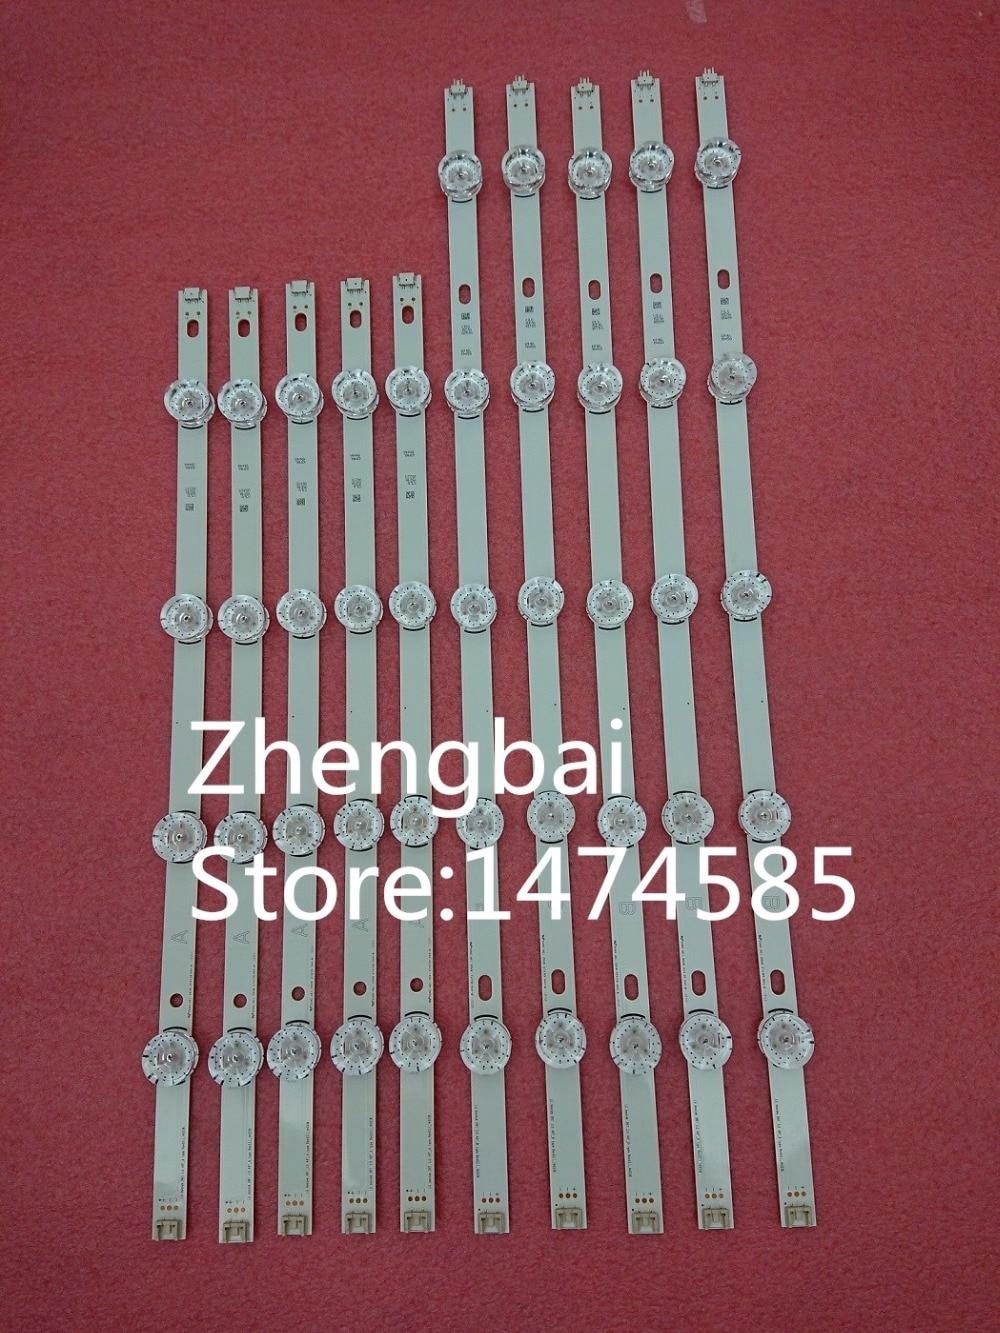 100%New 10 PCS/set LED Backlight strip For LG 49Inch TV 49LB5550 49LF5500 Innotek DRT 3.0 49A/B 6916L-1944A 6916L-1945A